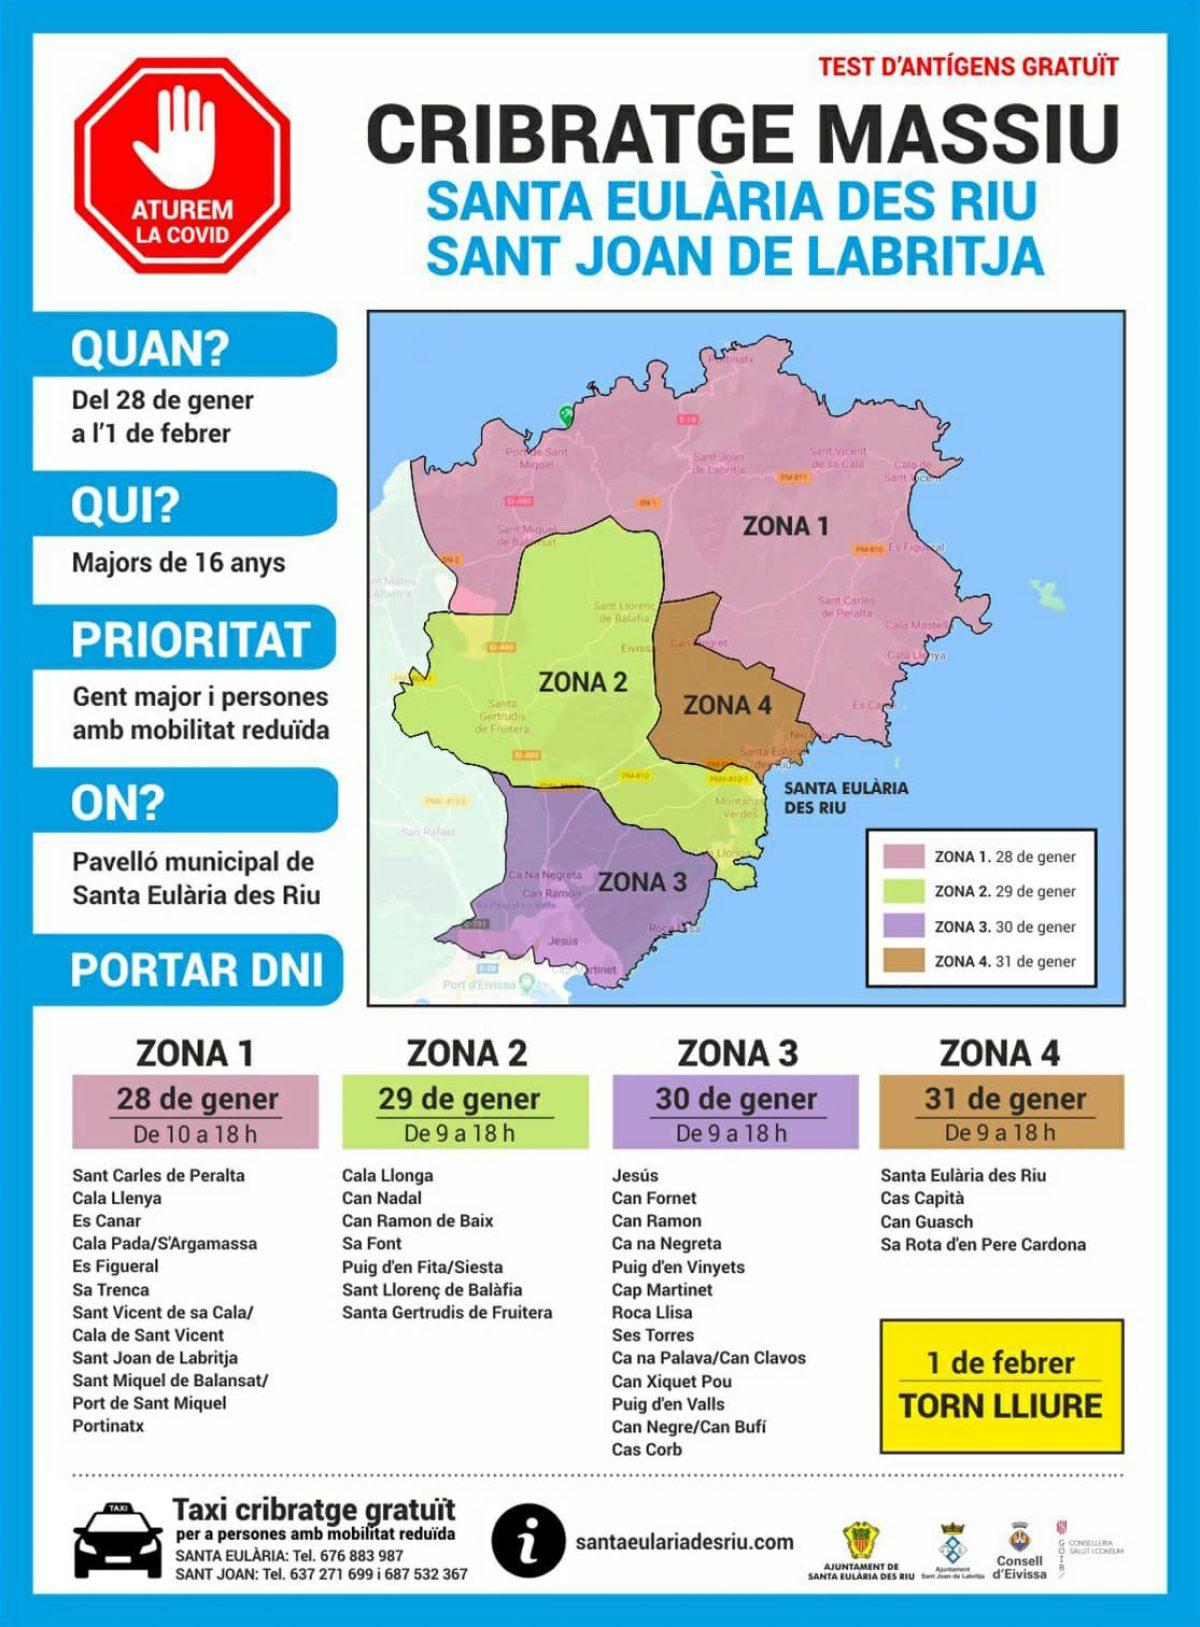 cribado-masivo-covid-19-santa-eulalia-ibiza-enero-2021-welcometoibiza